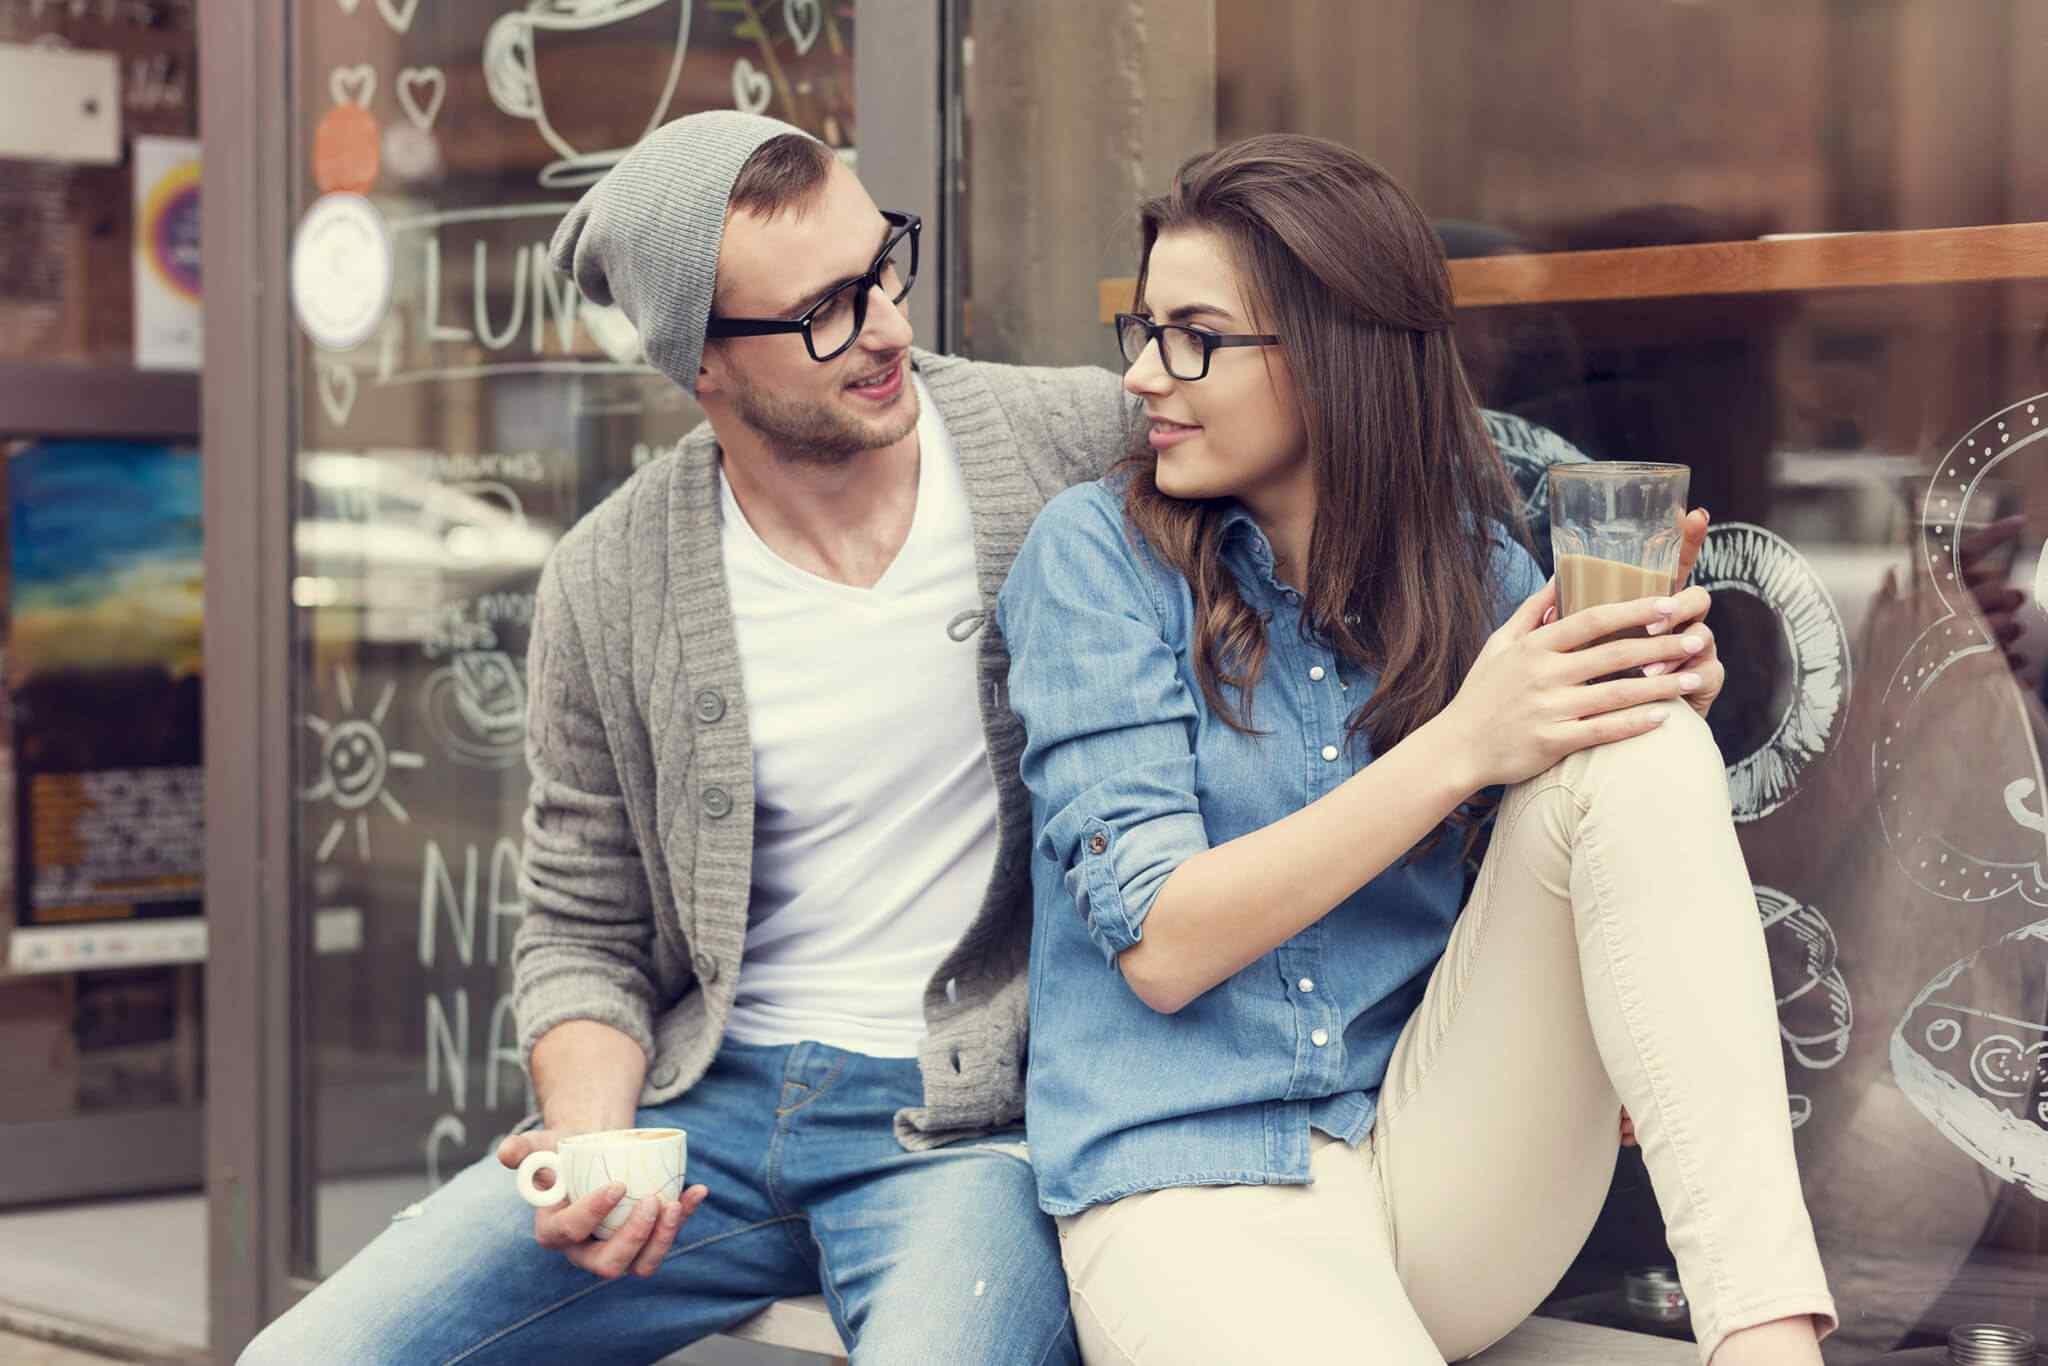 https://i0.wp.com/truhap.com/wp-content/uploads/2018/01/img-class-marriage-02.jpg?fit=2048%2C1366&ssl=1